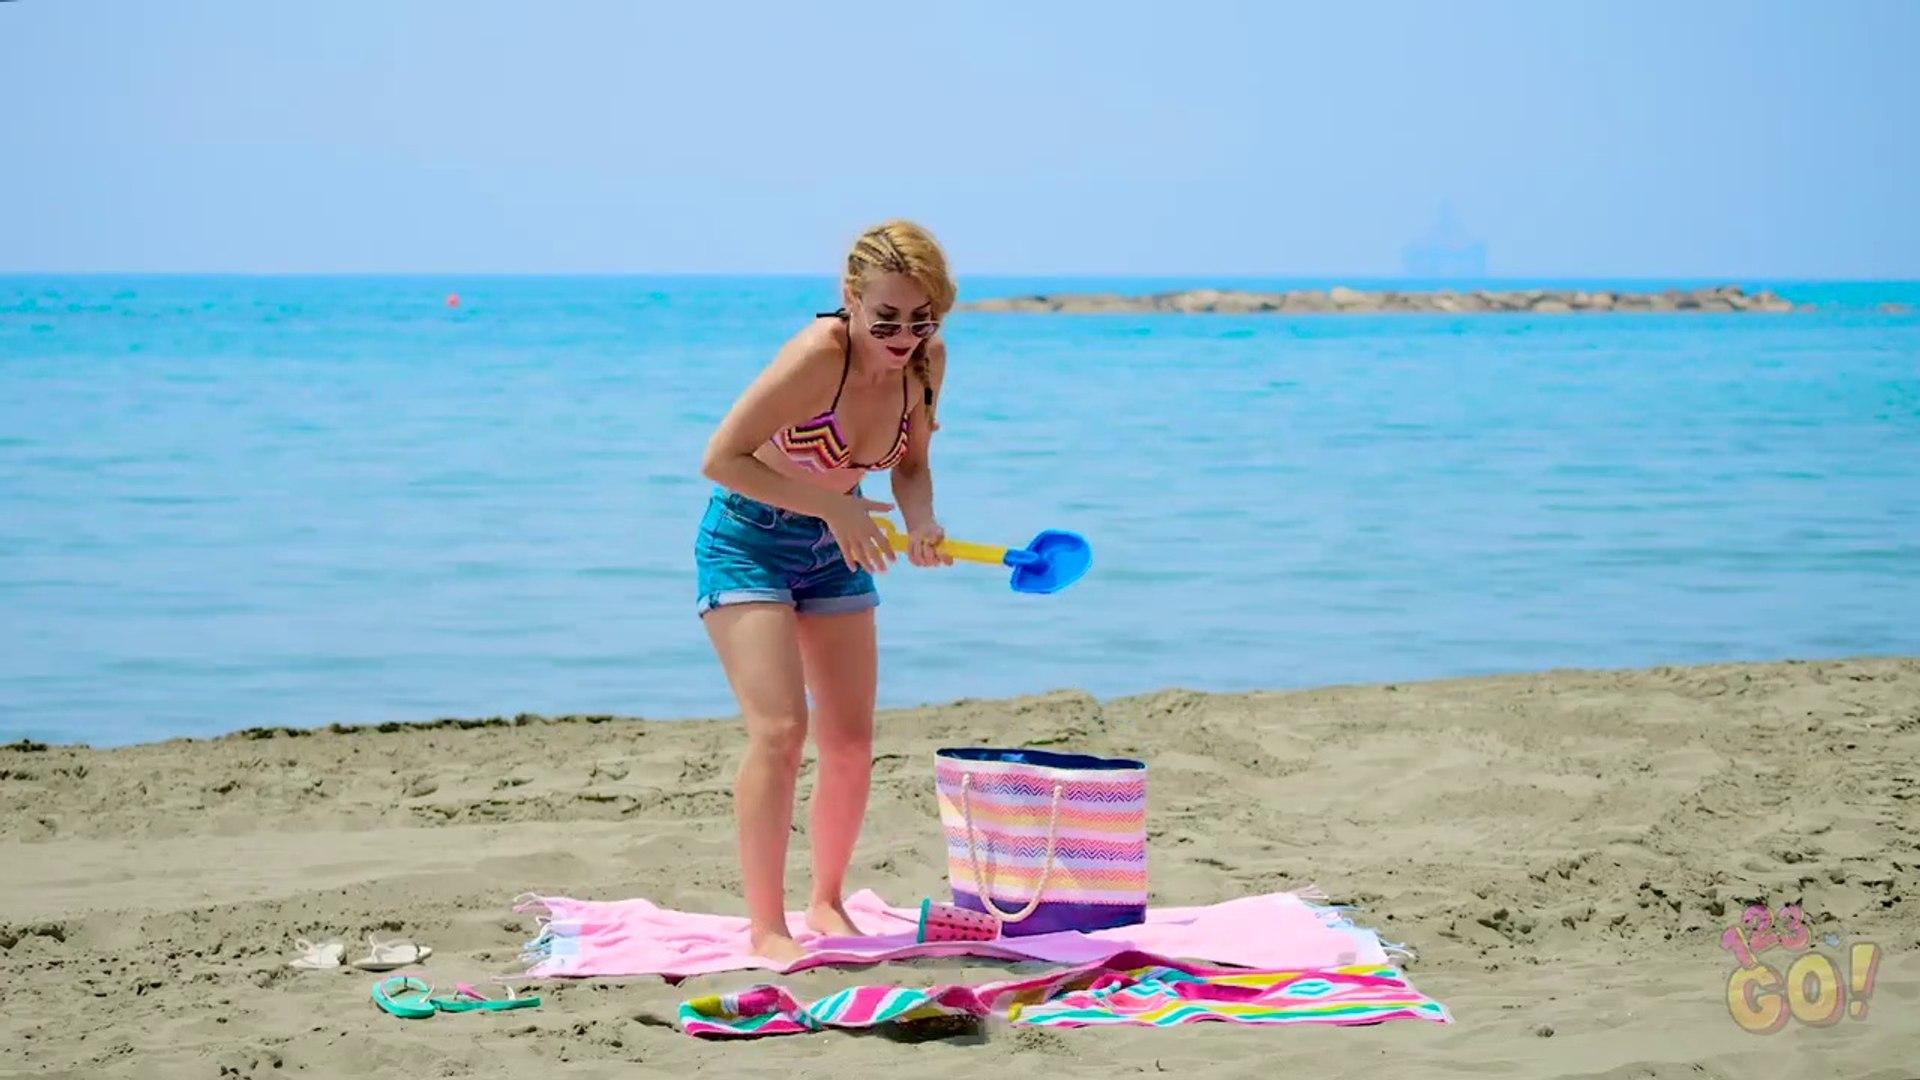 FUNNY SUMMER DIY PRANKS!  Best DIY Pranks on Friends  Family by 123 GO!